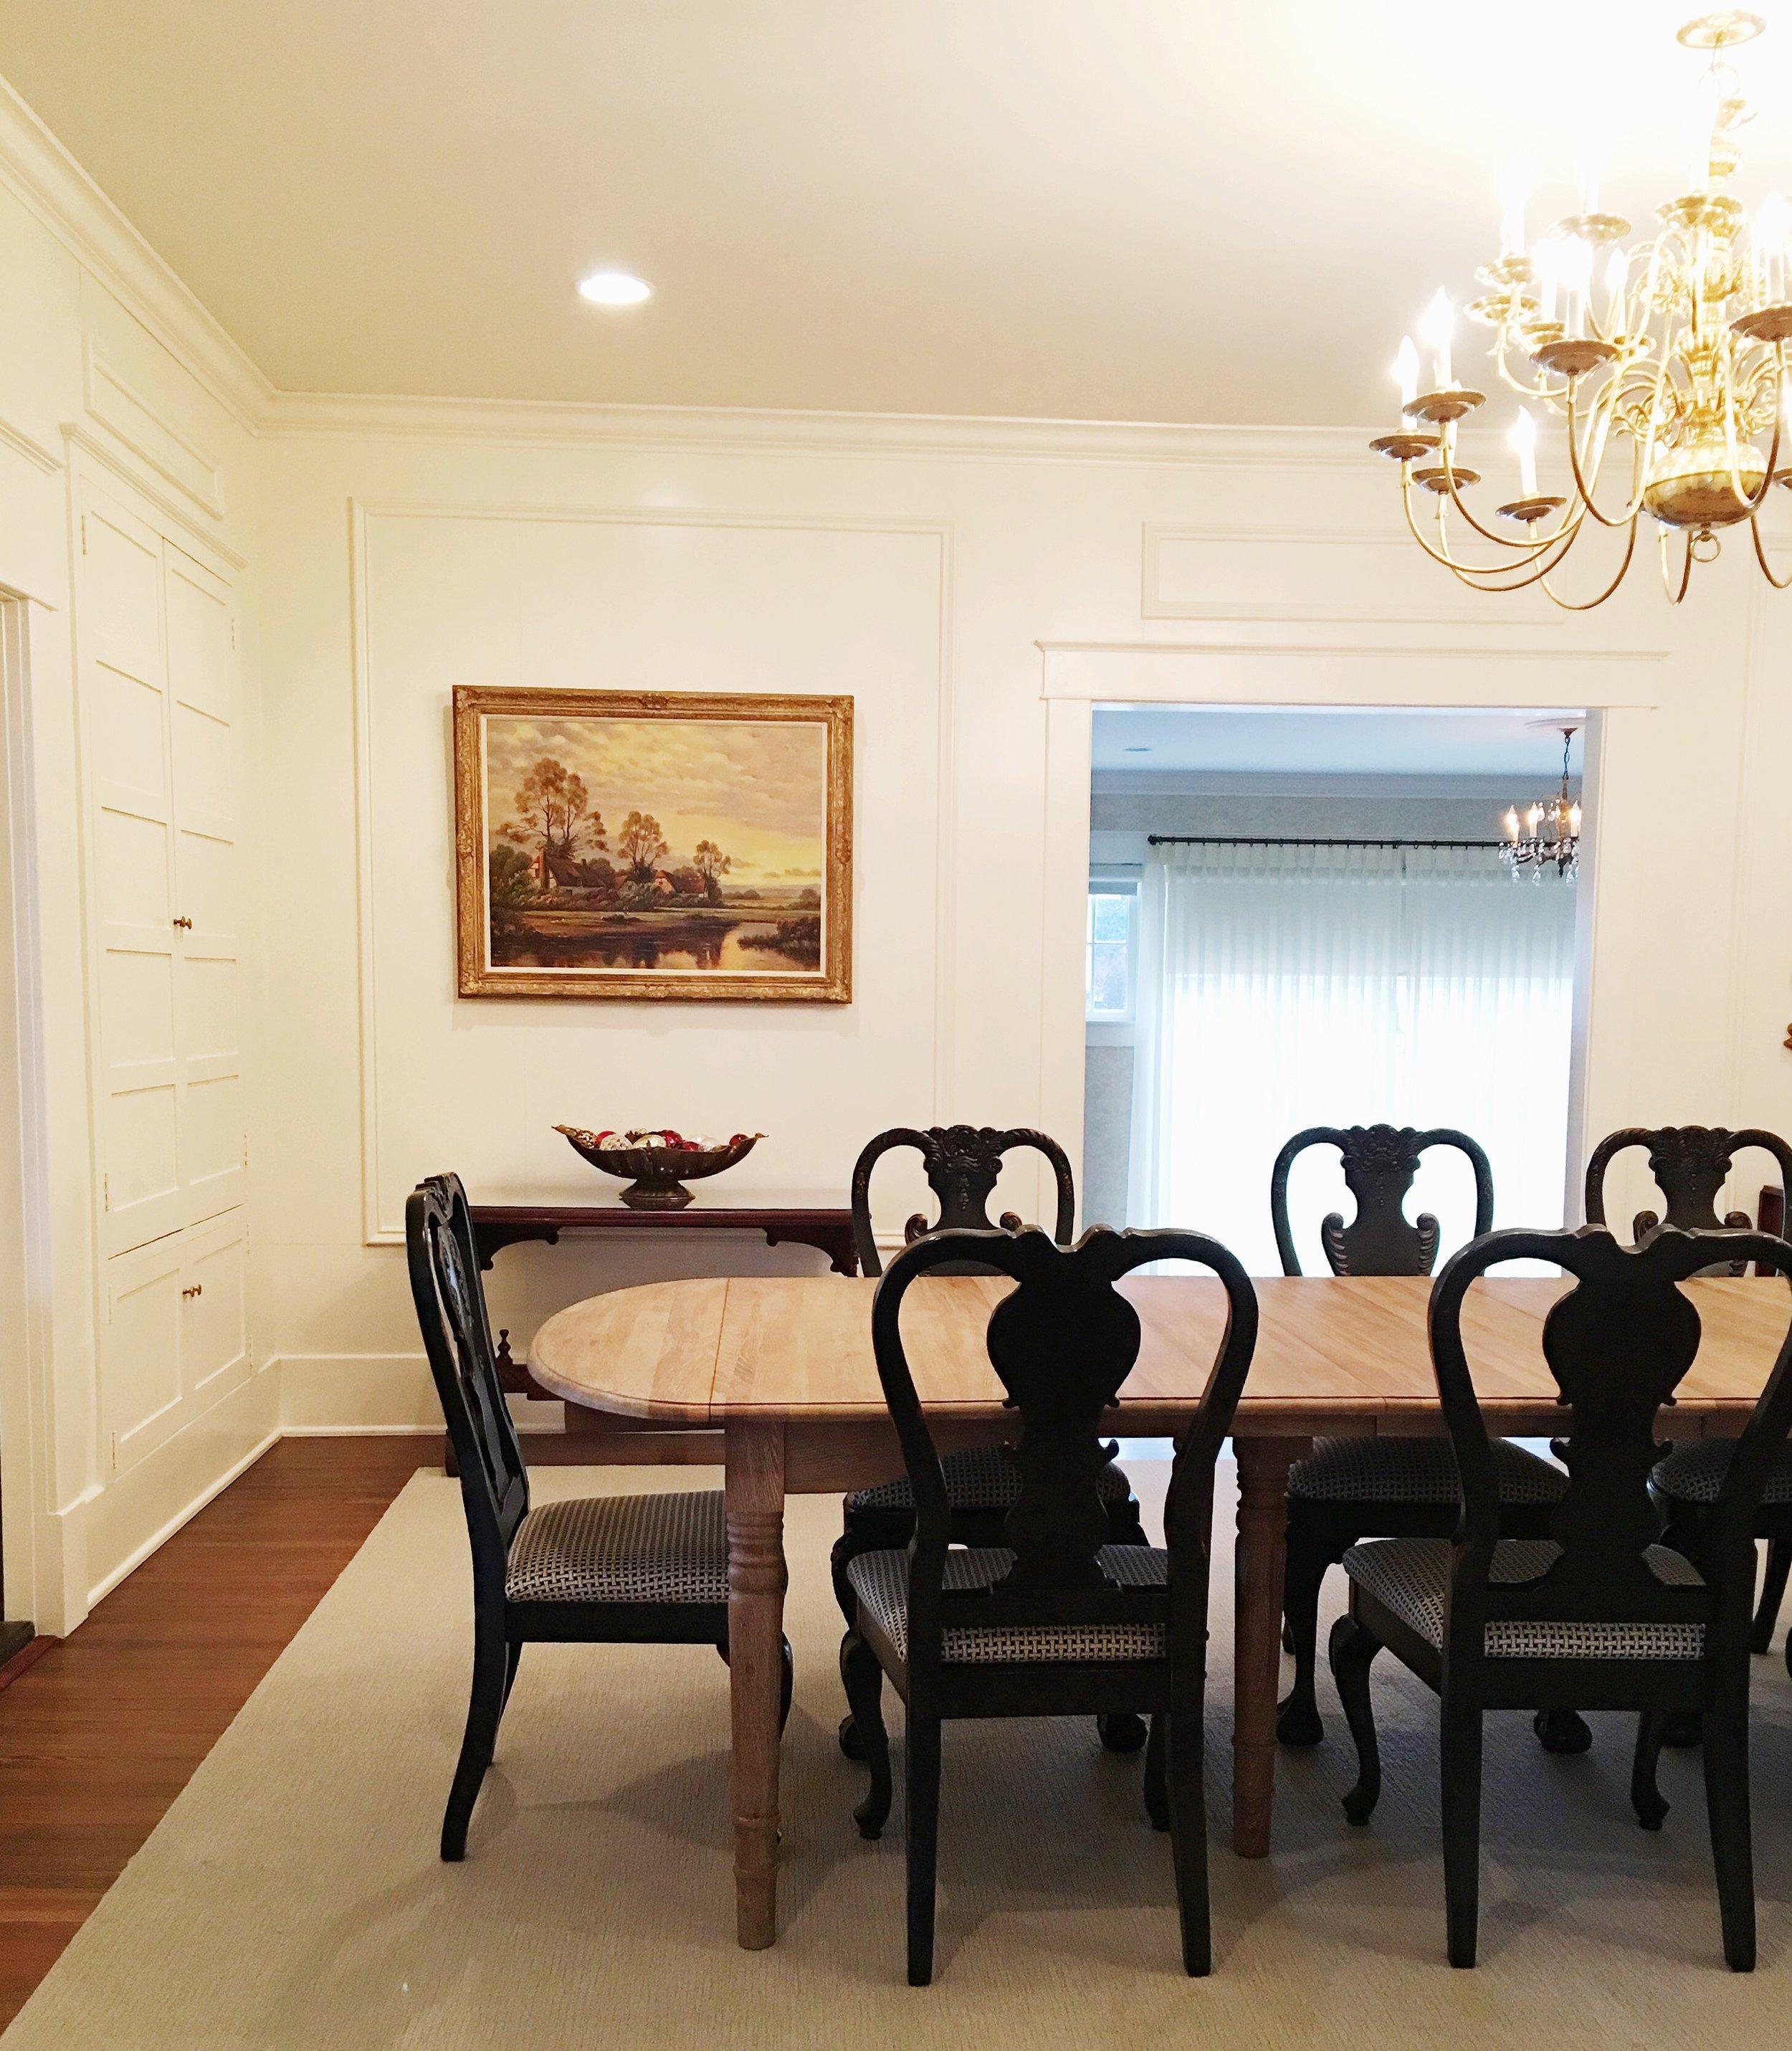 sharpe-house-dining-room